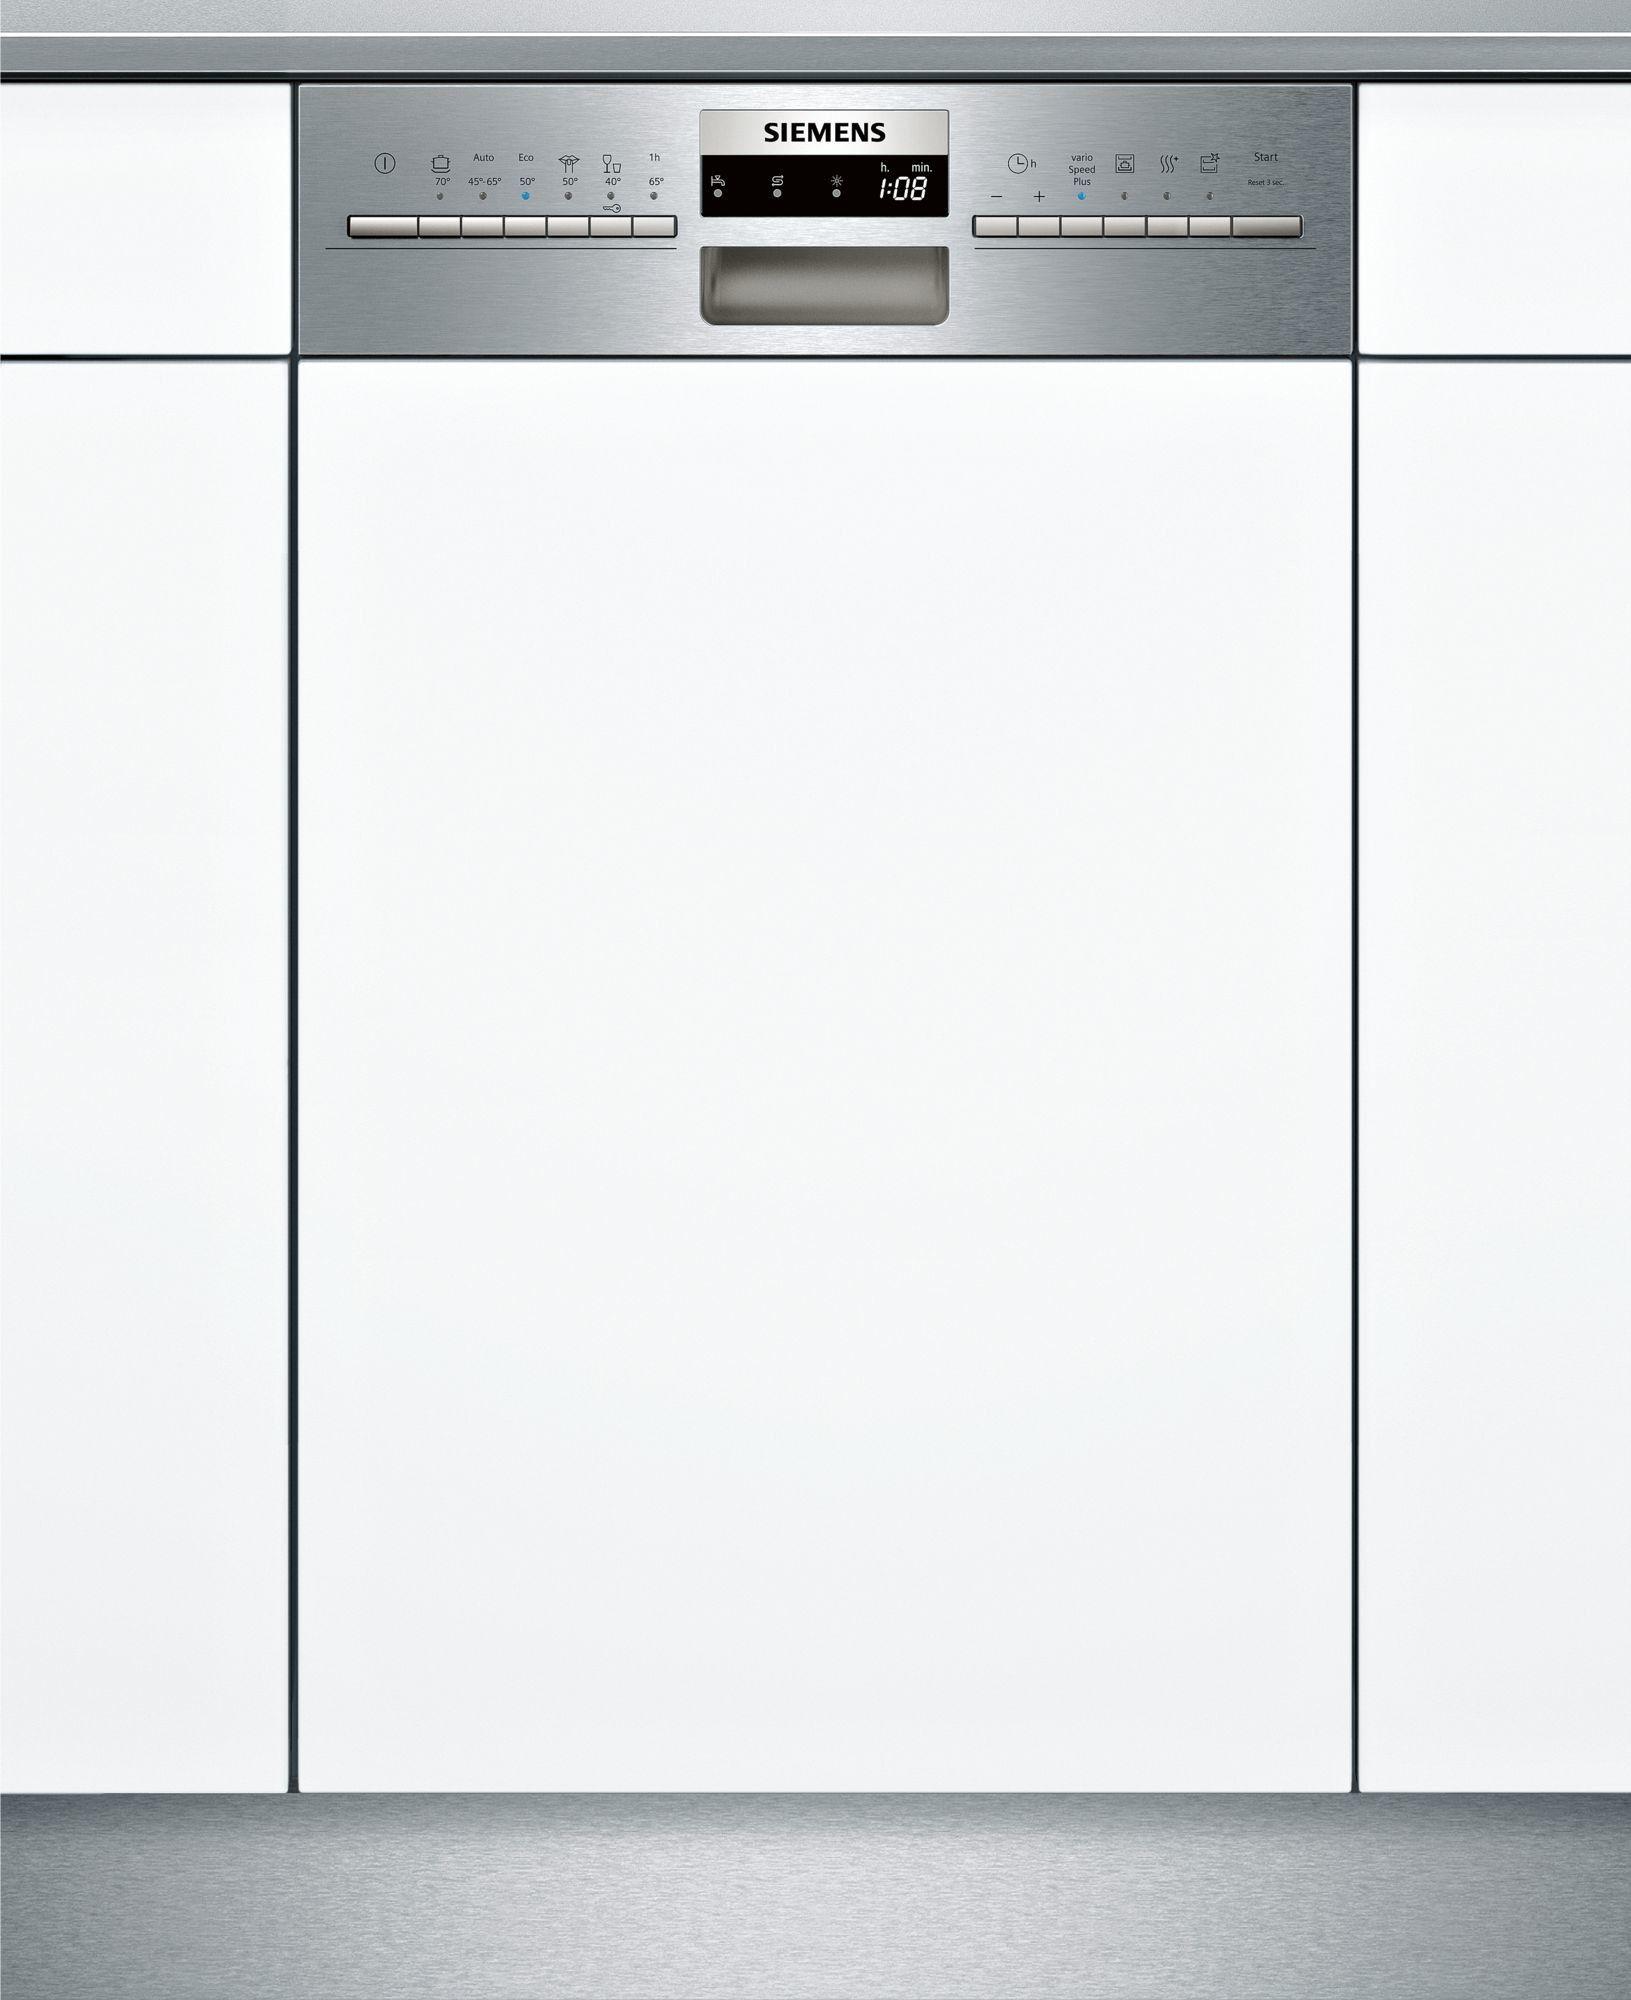 Buy Siemens Iq300 Sr536s07ie Dishwasher Semi Built In 9 Place